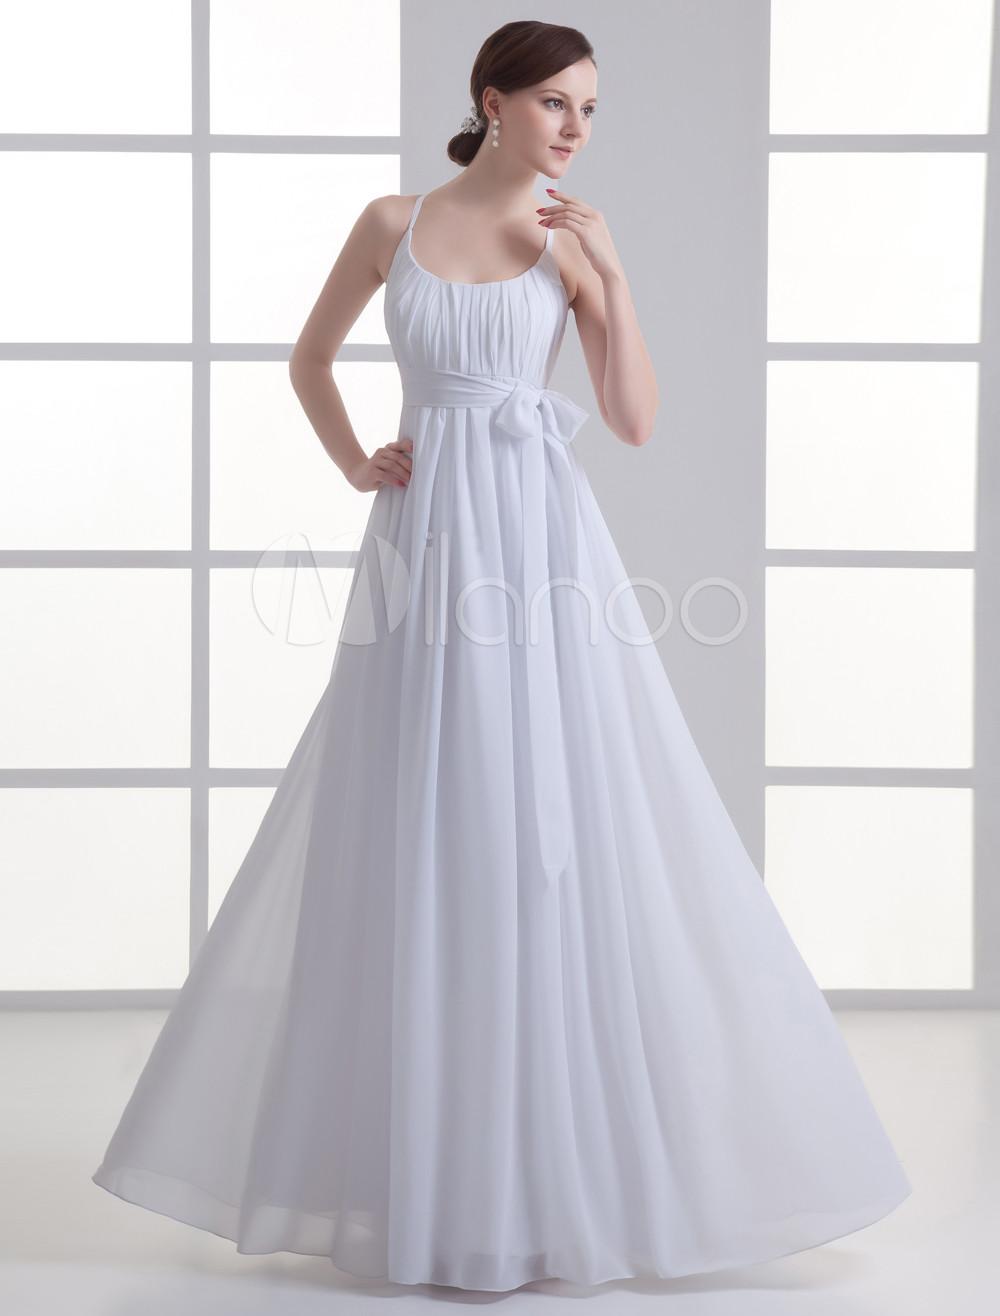 White A-line Jewel Neck Bow Chiffon Bridal Wedding Dress